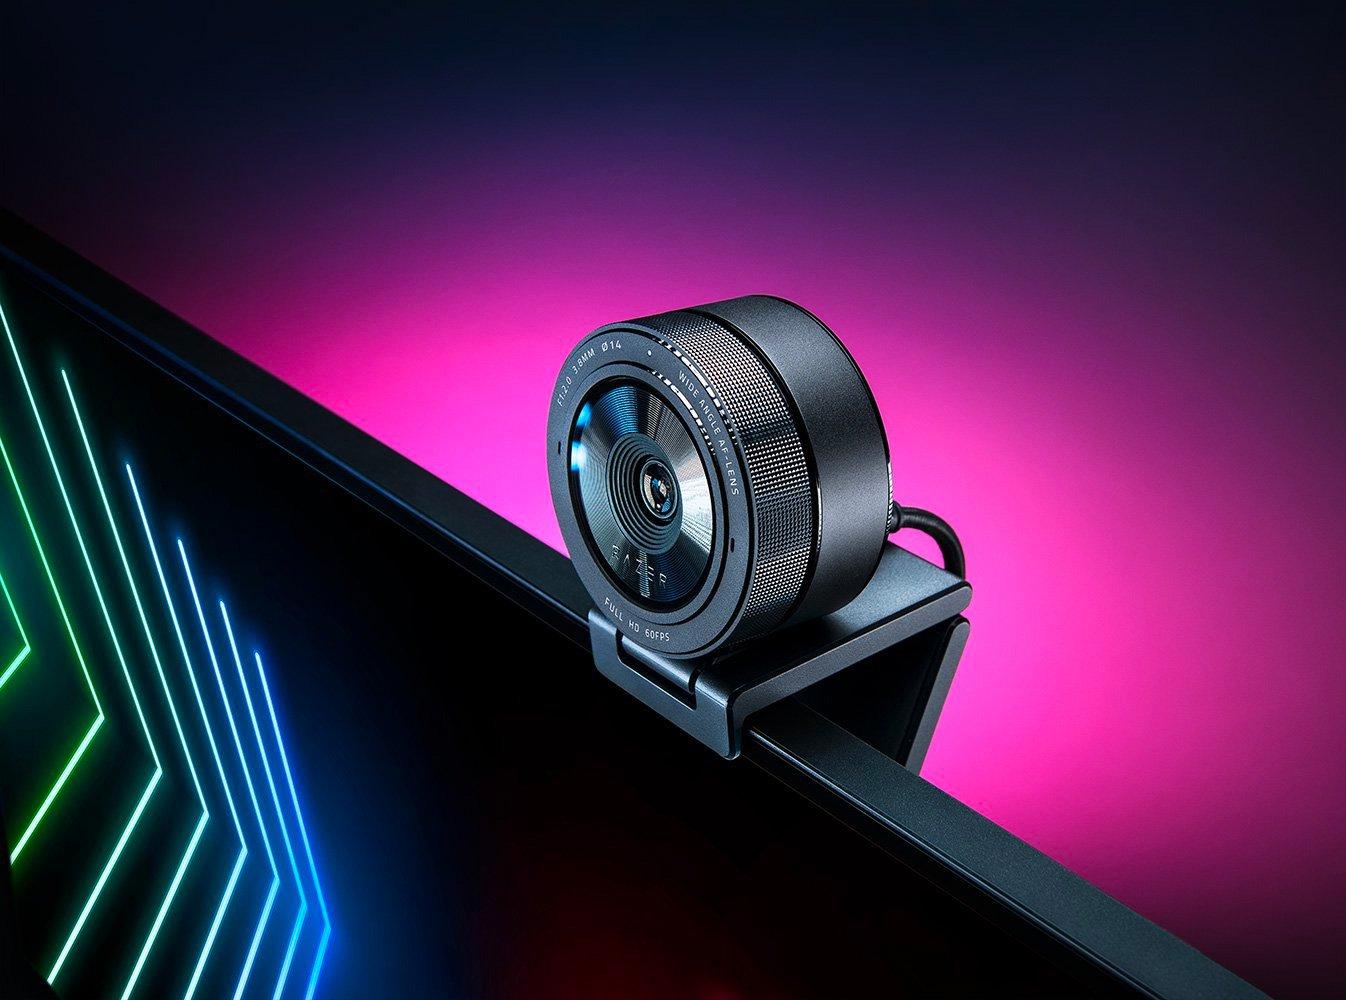 Show Them Your Best Self with Razer's Kiyo Pro Webcam at werd.com